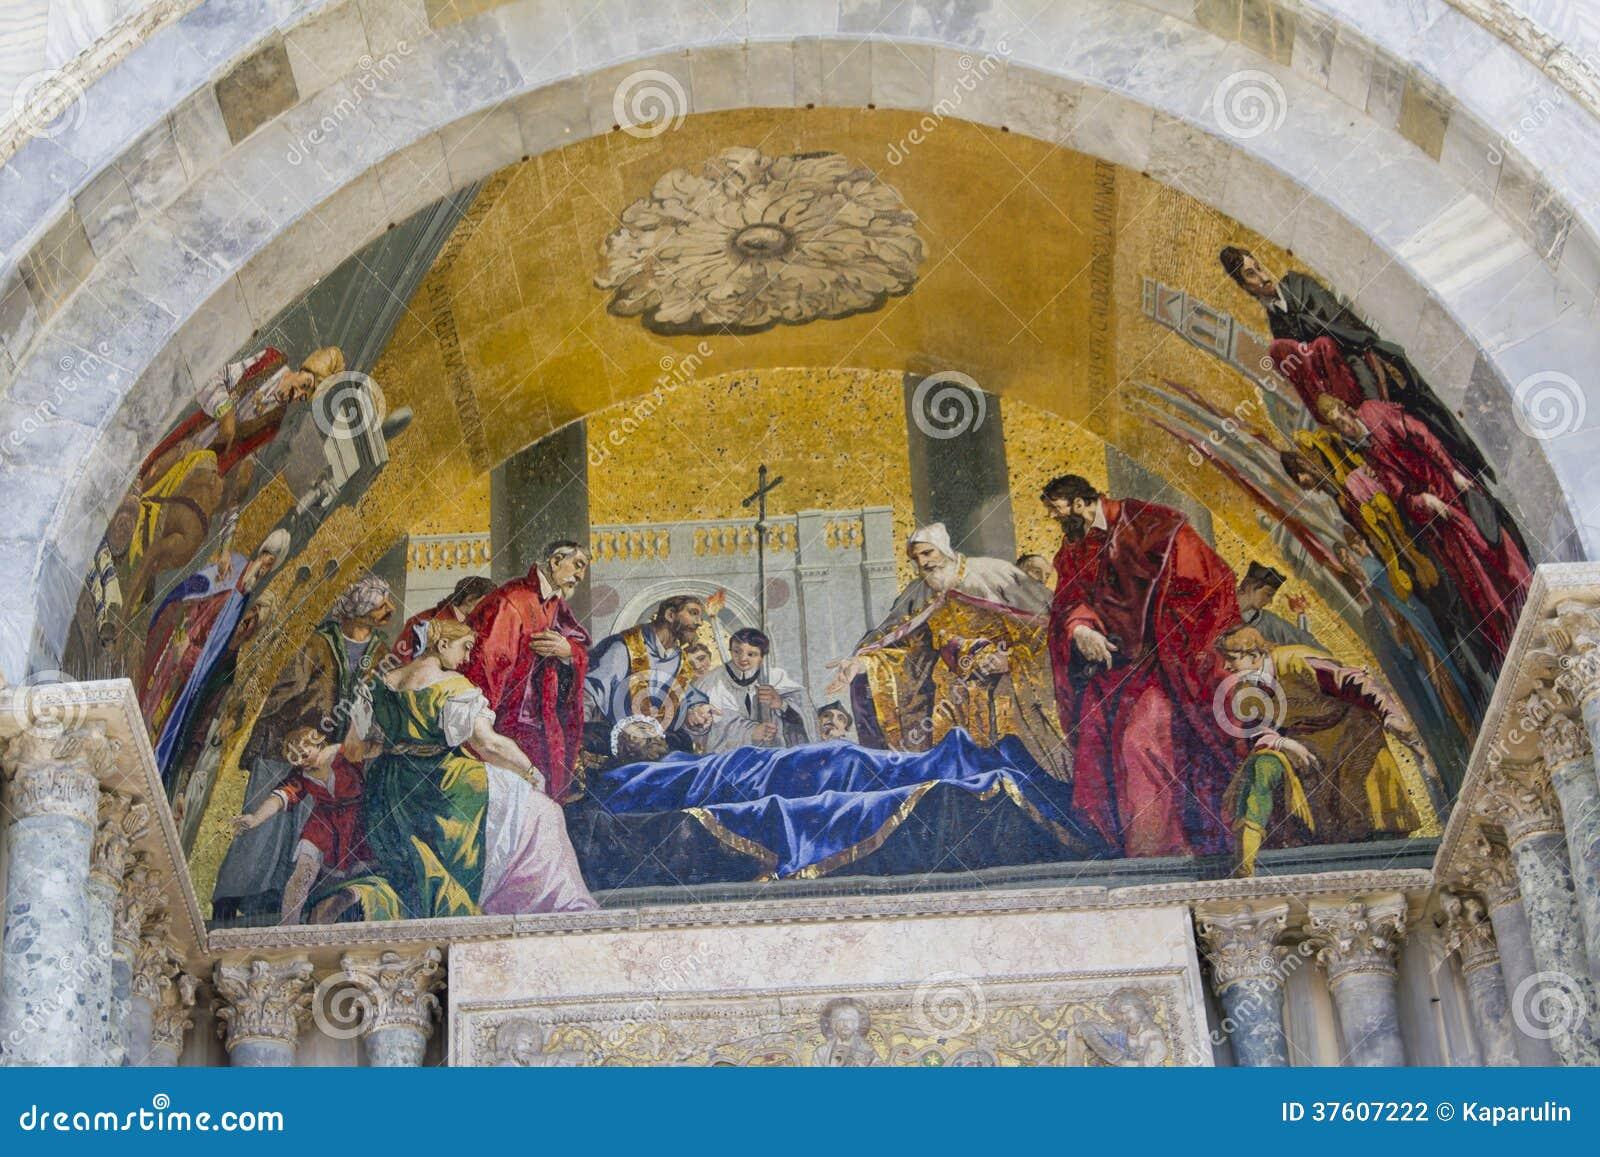 Fresco Basilica Di San Marco Stock Photo - Image of building ...